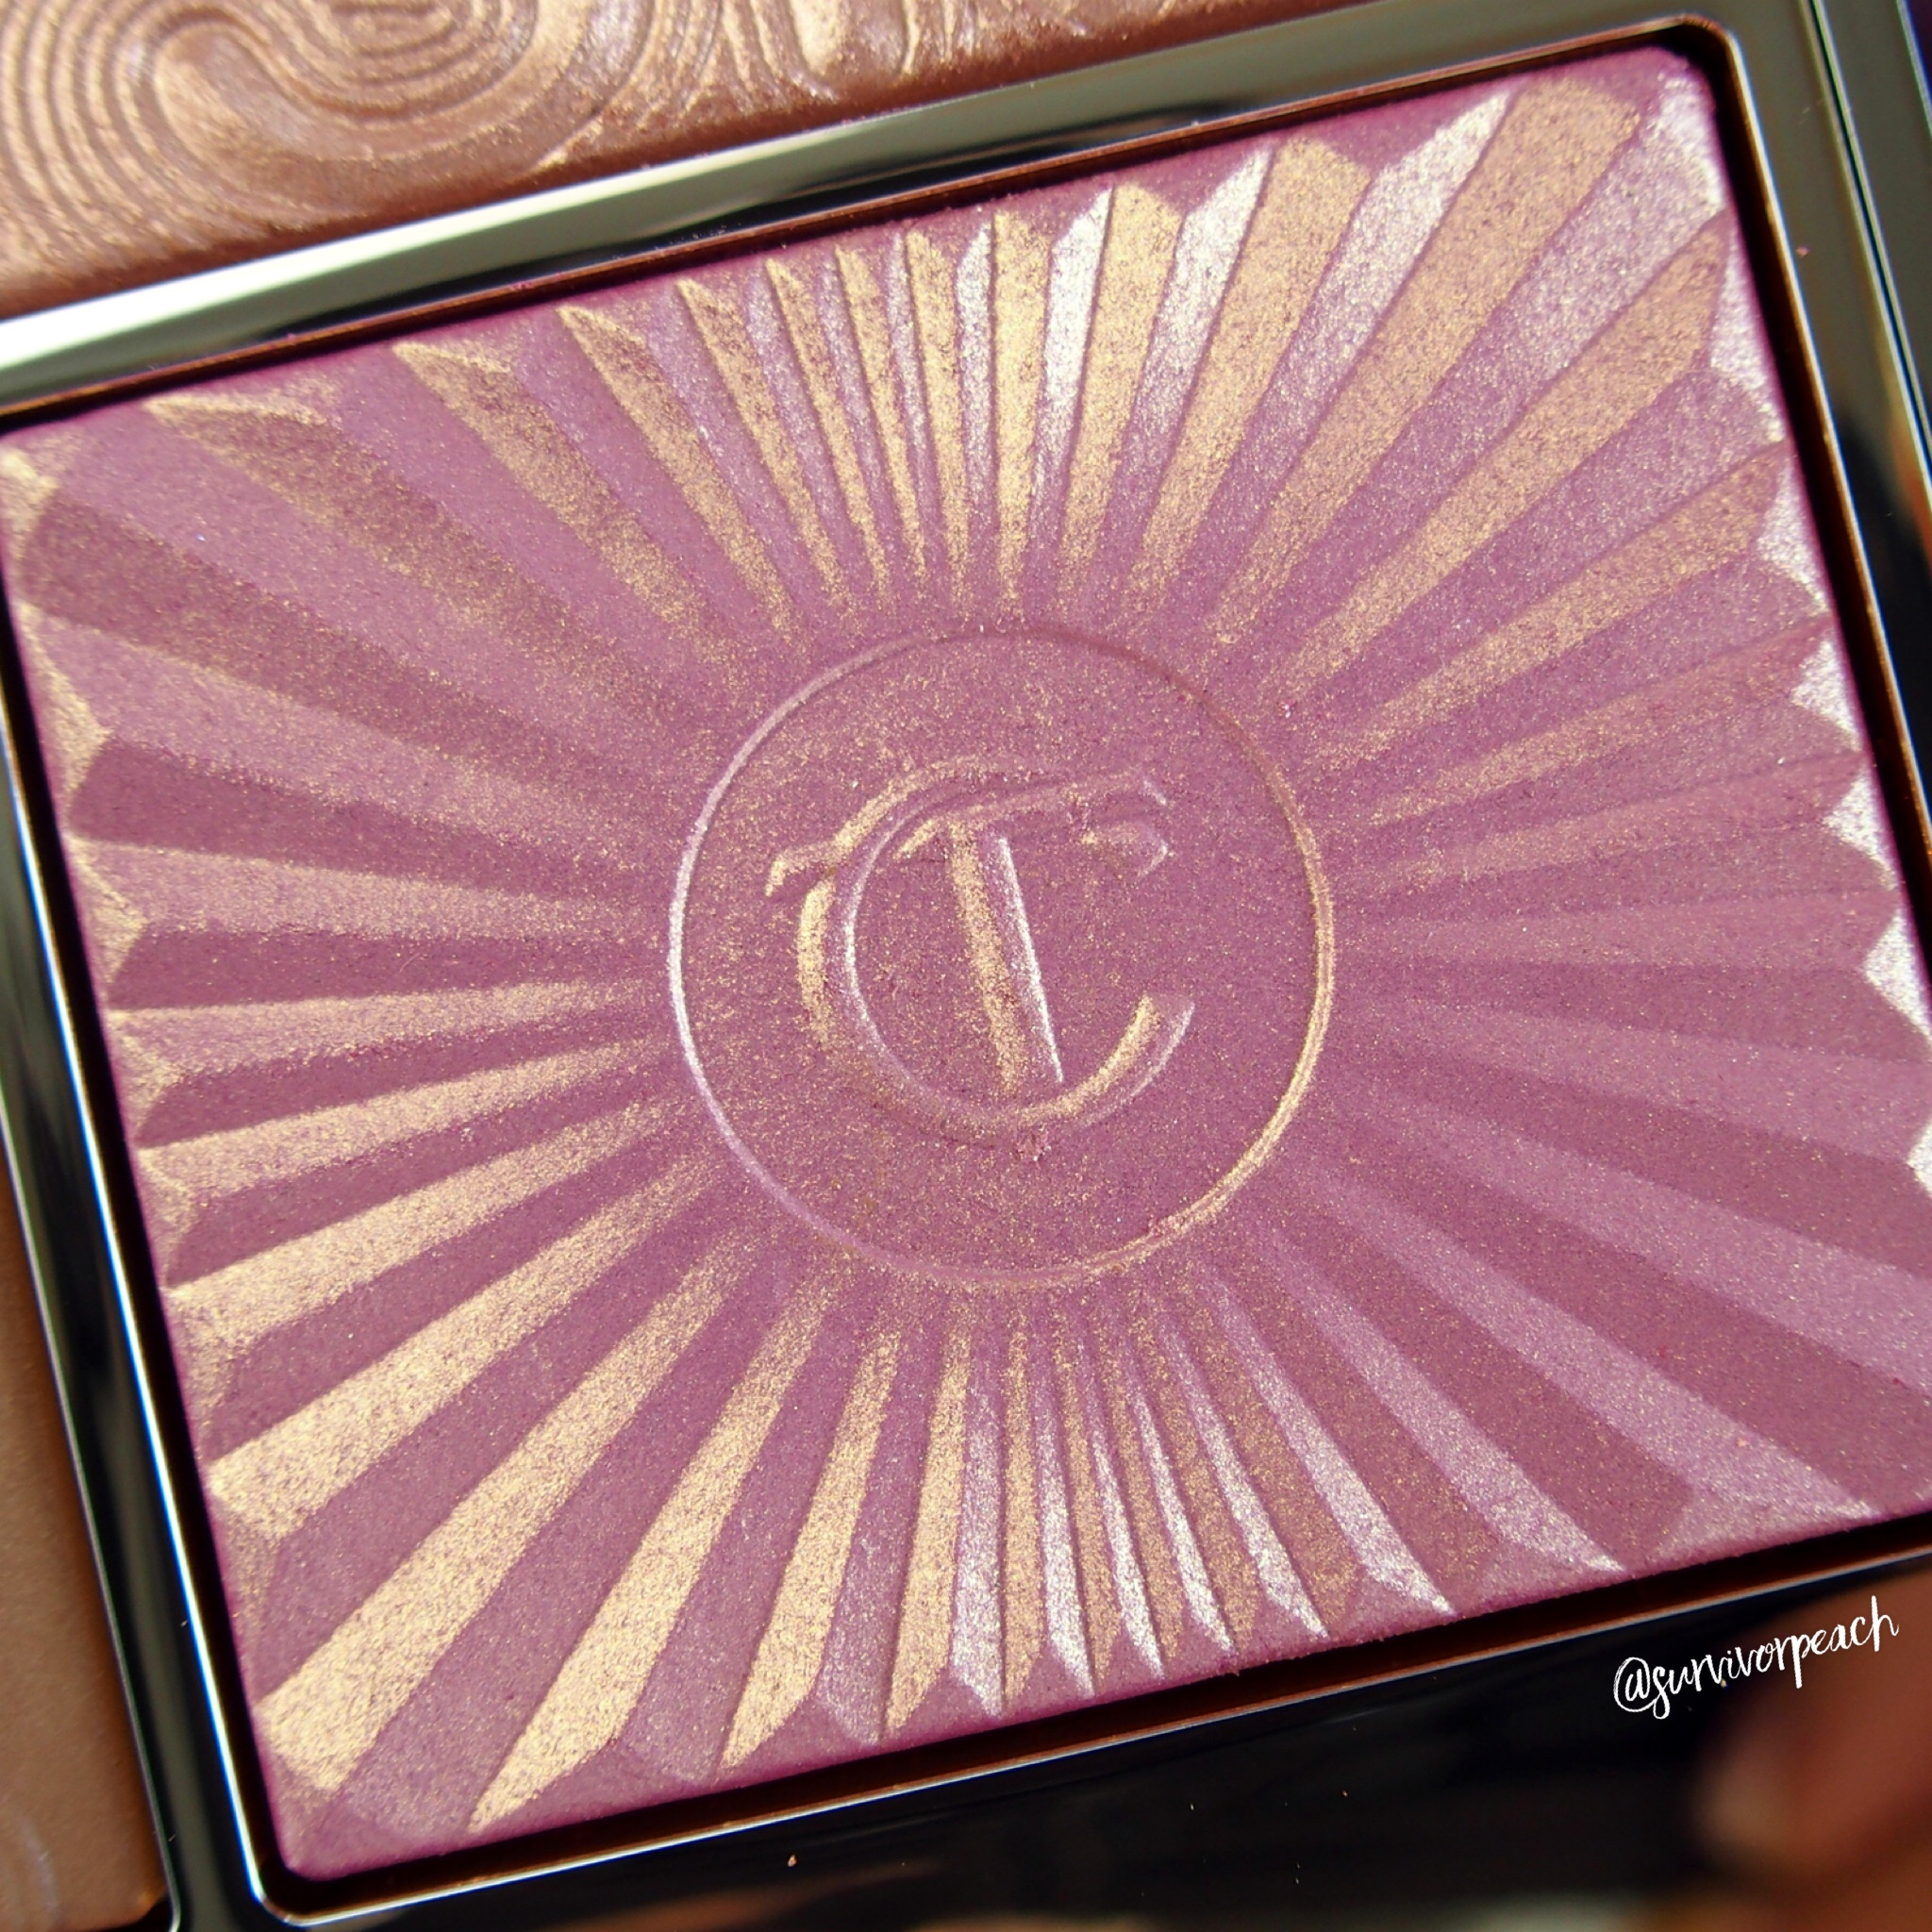 Charlotte Tilbury Glowgasm palette - Lightgasm